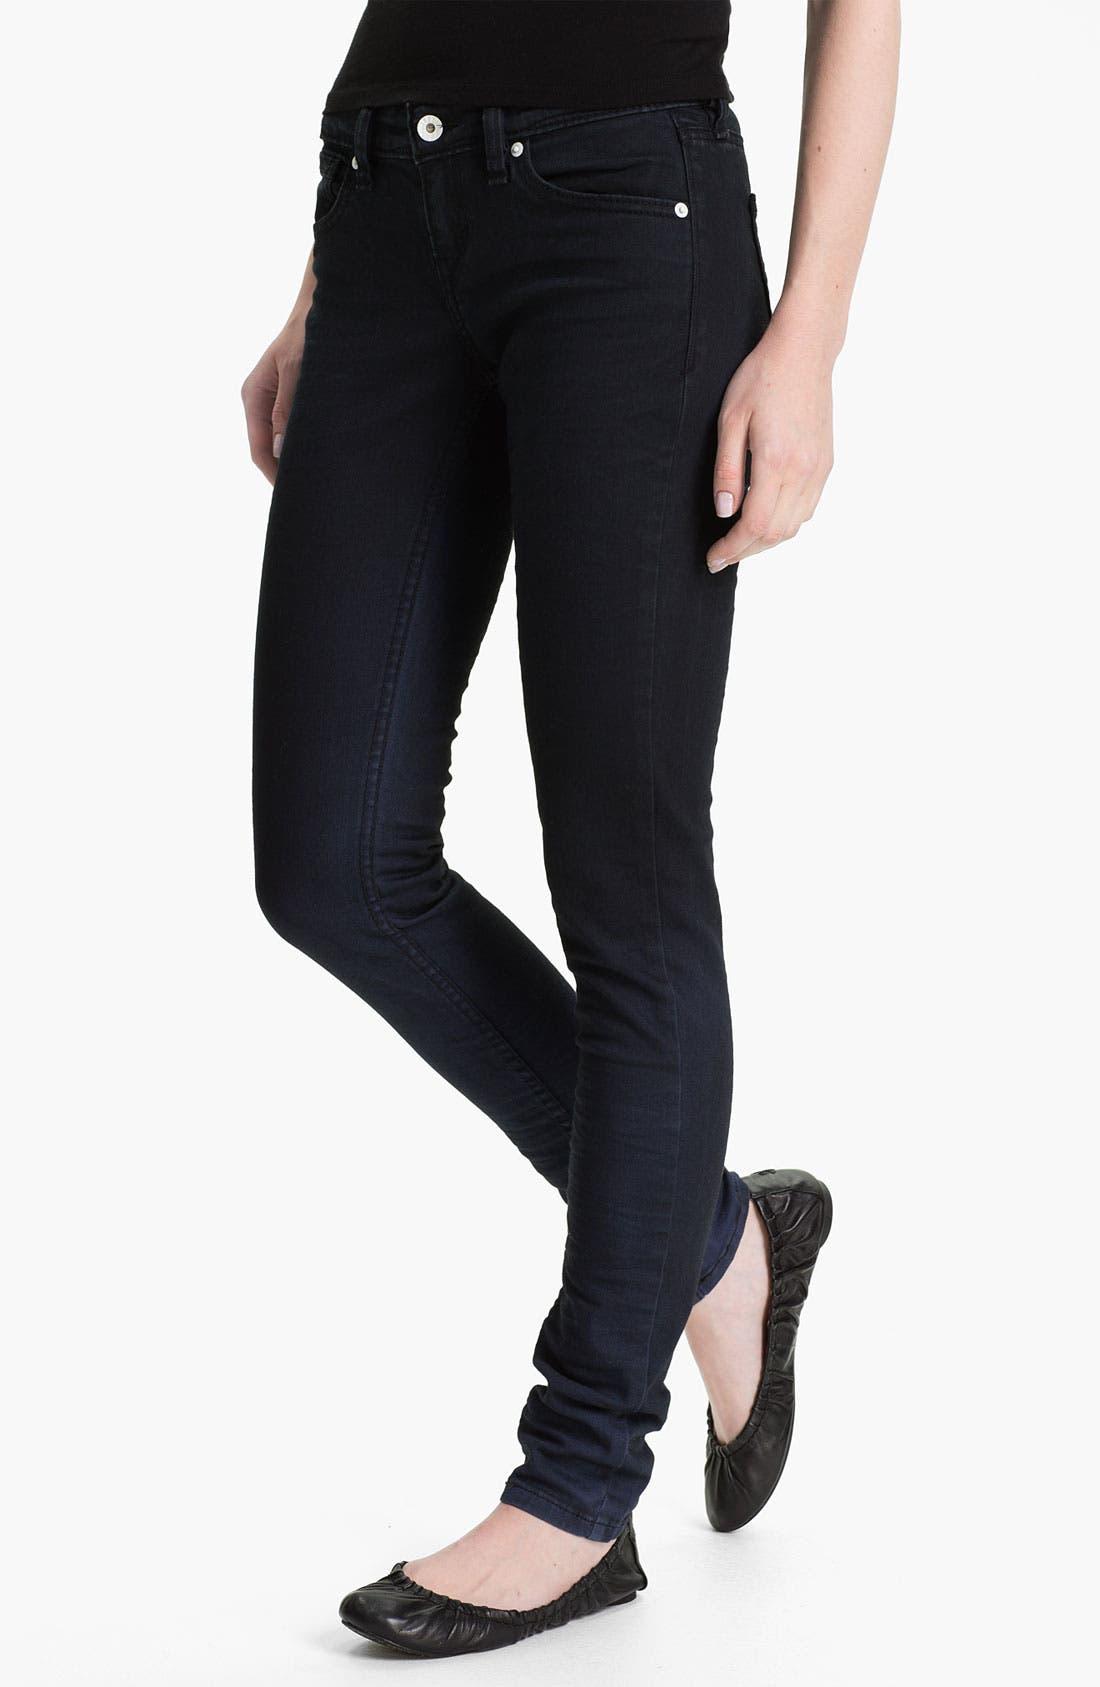 Alternate Image 1 Selected - Levi's® Denim Leggings (Faded Blue)